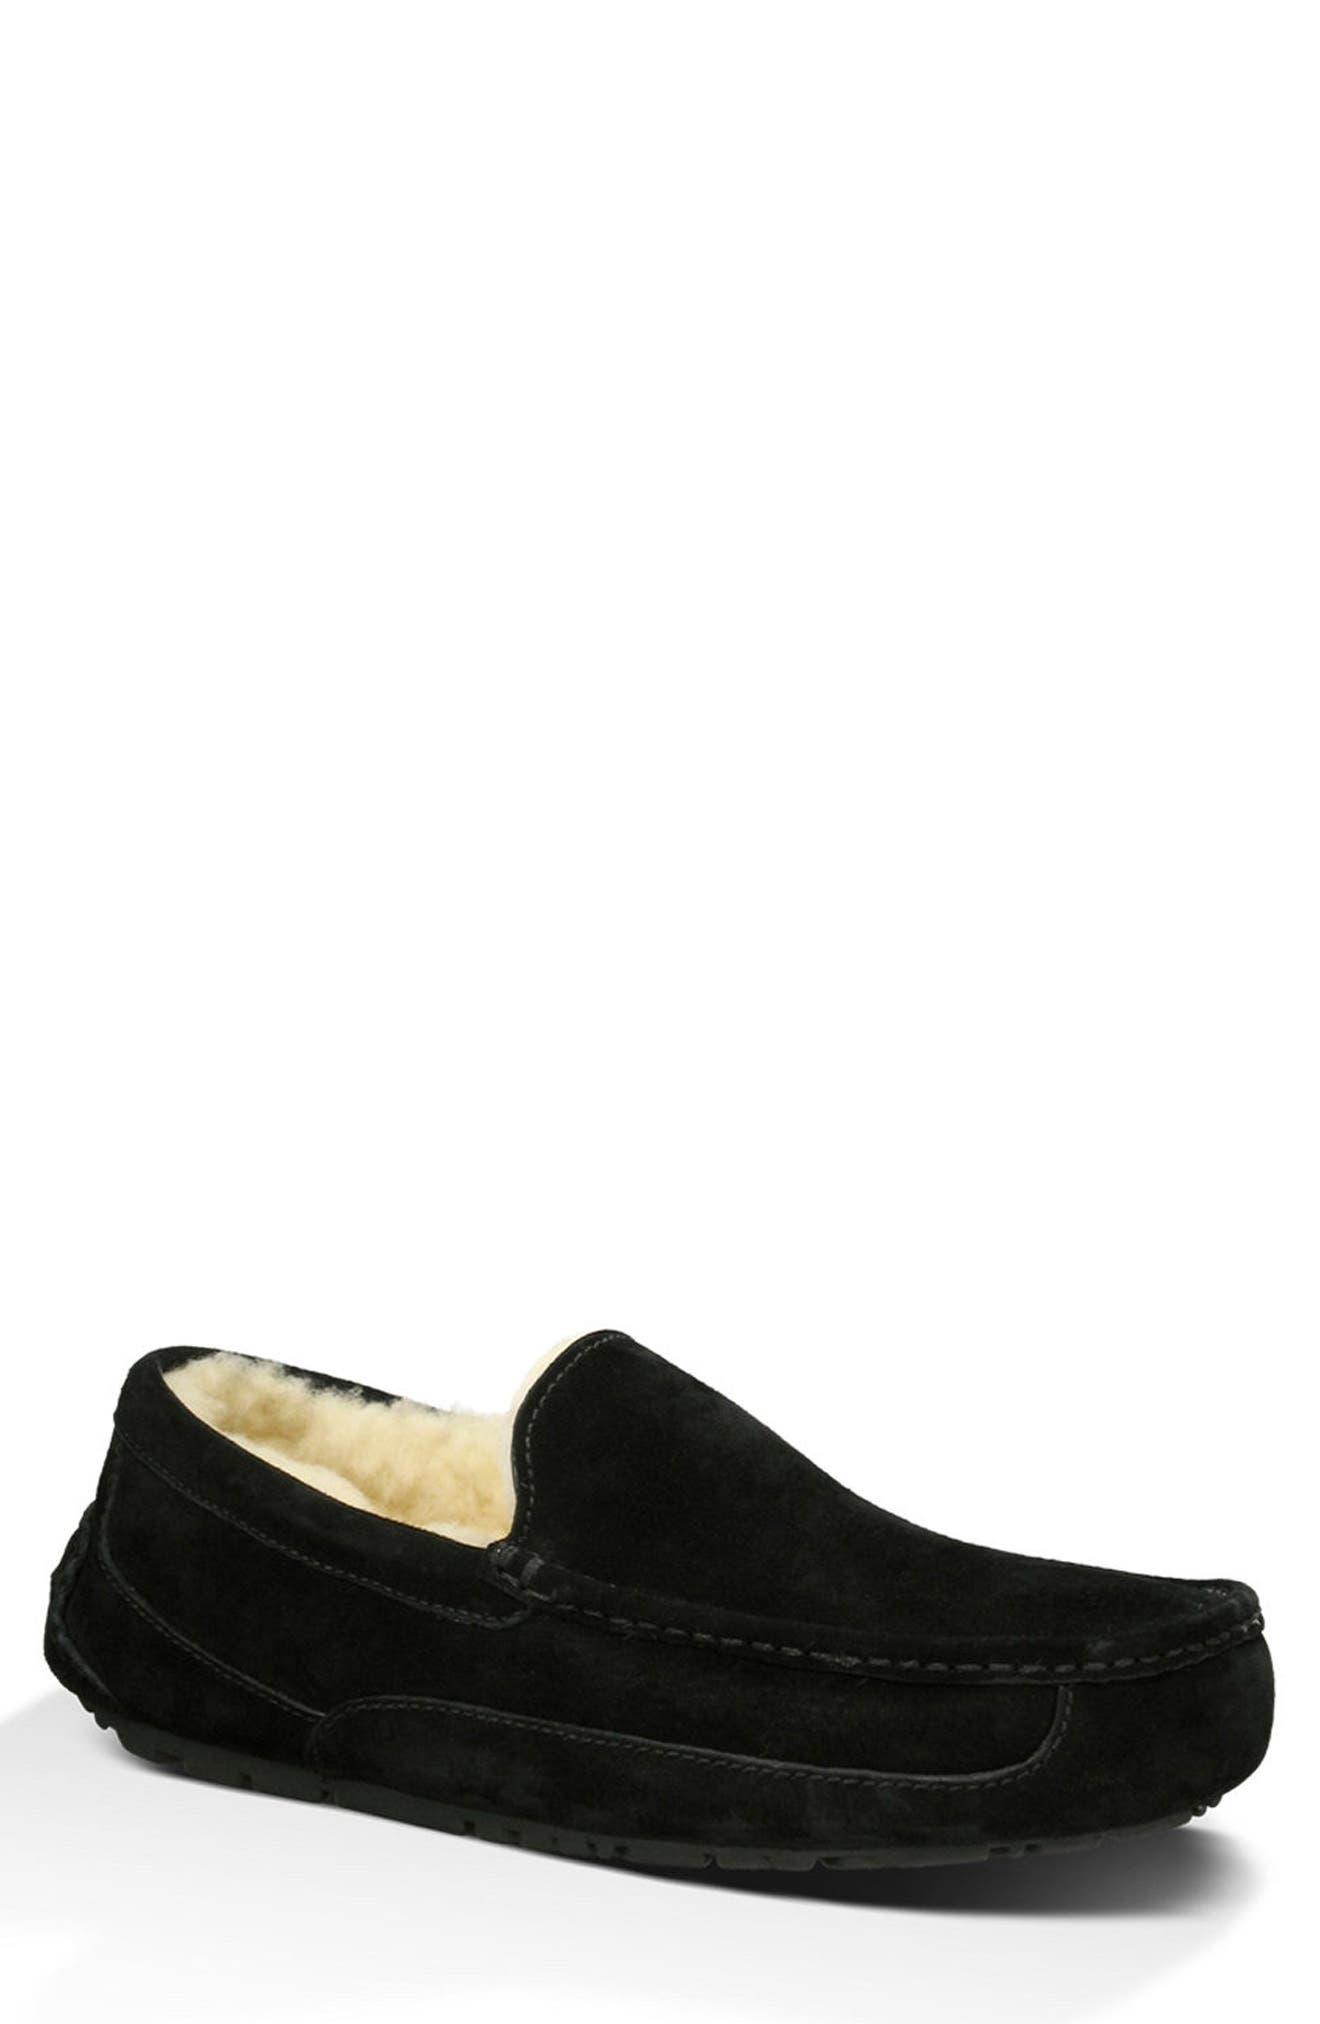 Ascot Slipper,                         Main,                         color, BLACK SUEDE